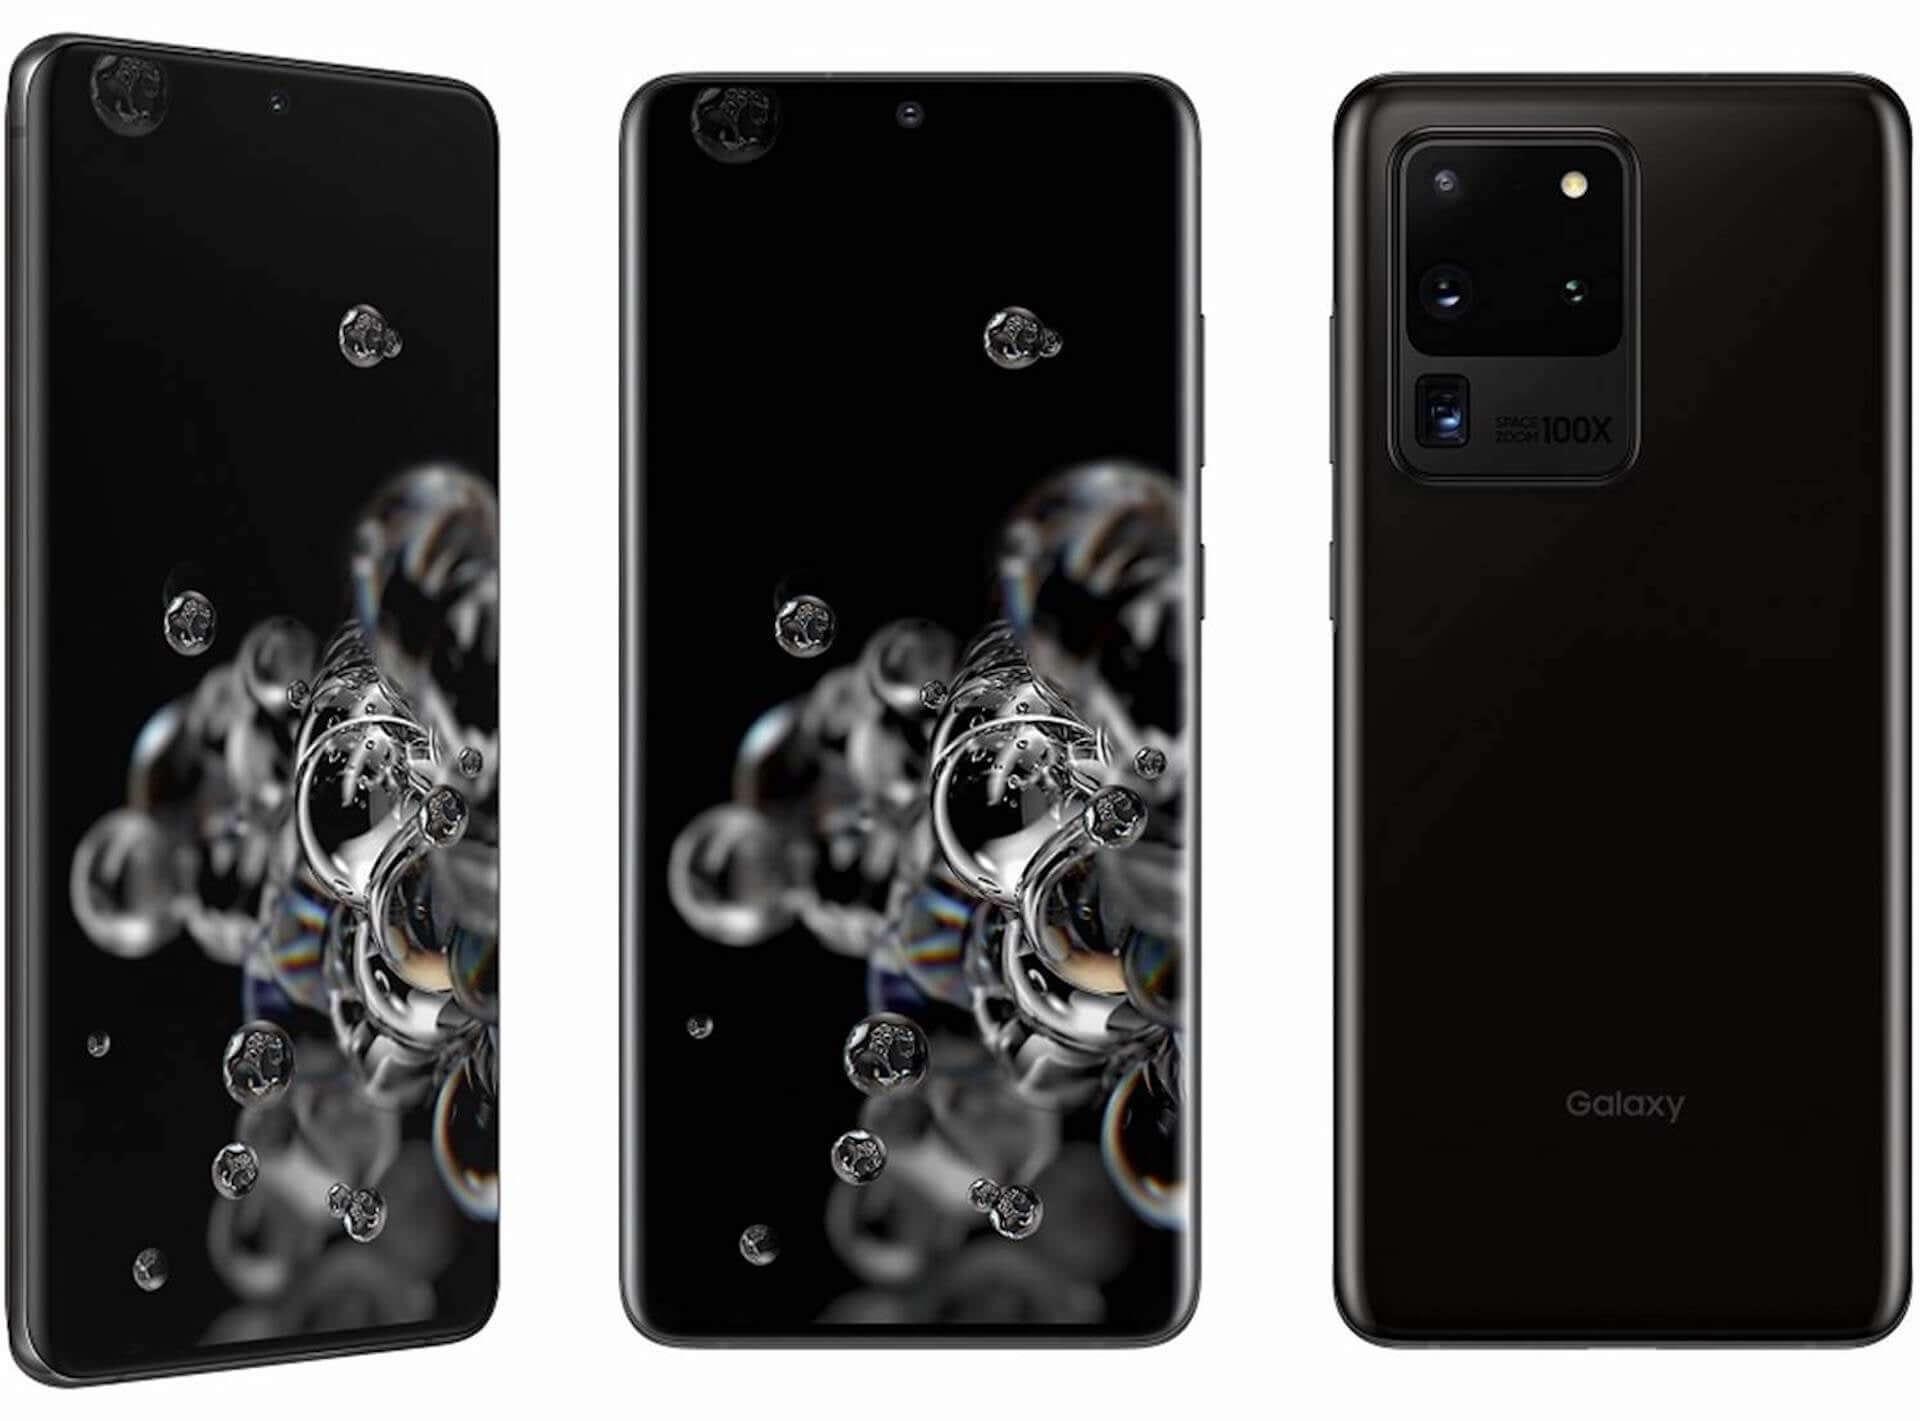 Galaxy史上最高の1億画素&100倍ズームカメラ搭載の5G対応スマホ『Galaxy S20 Ultra 5G』がKDDIから発売決定!撮影用スタンドのプレゼントキャンペーンも tech200624_galaxy_1-1920x1421